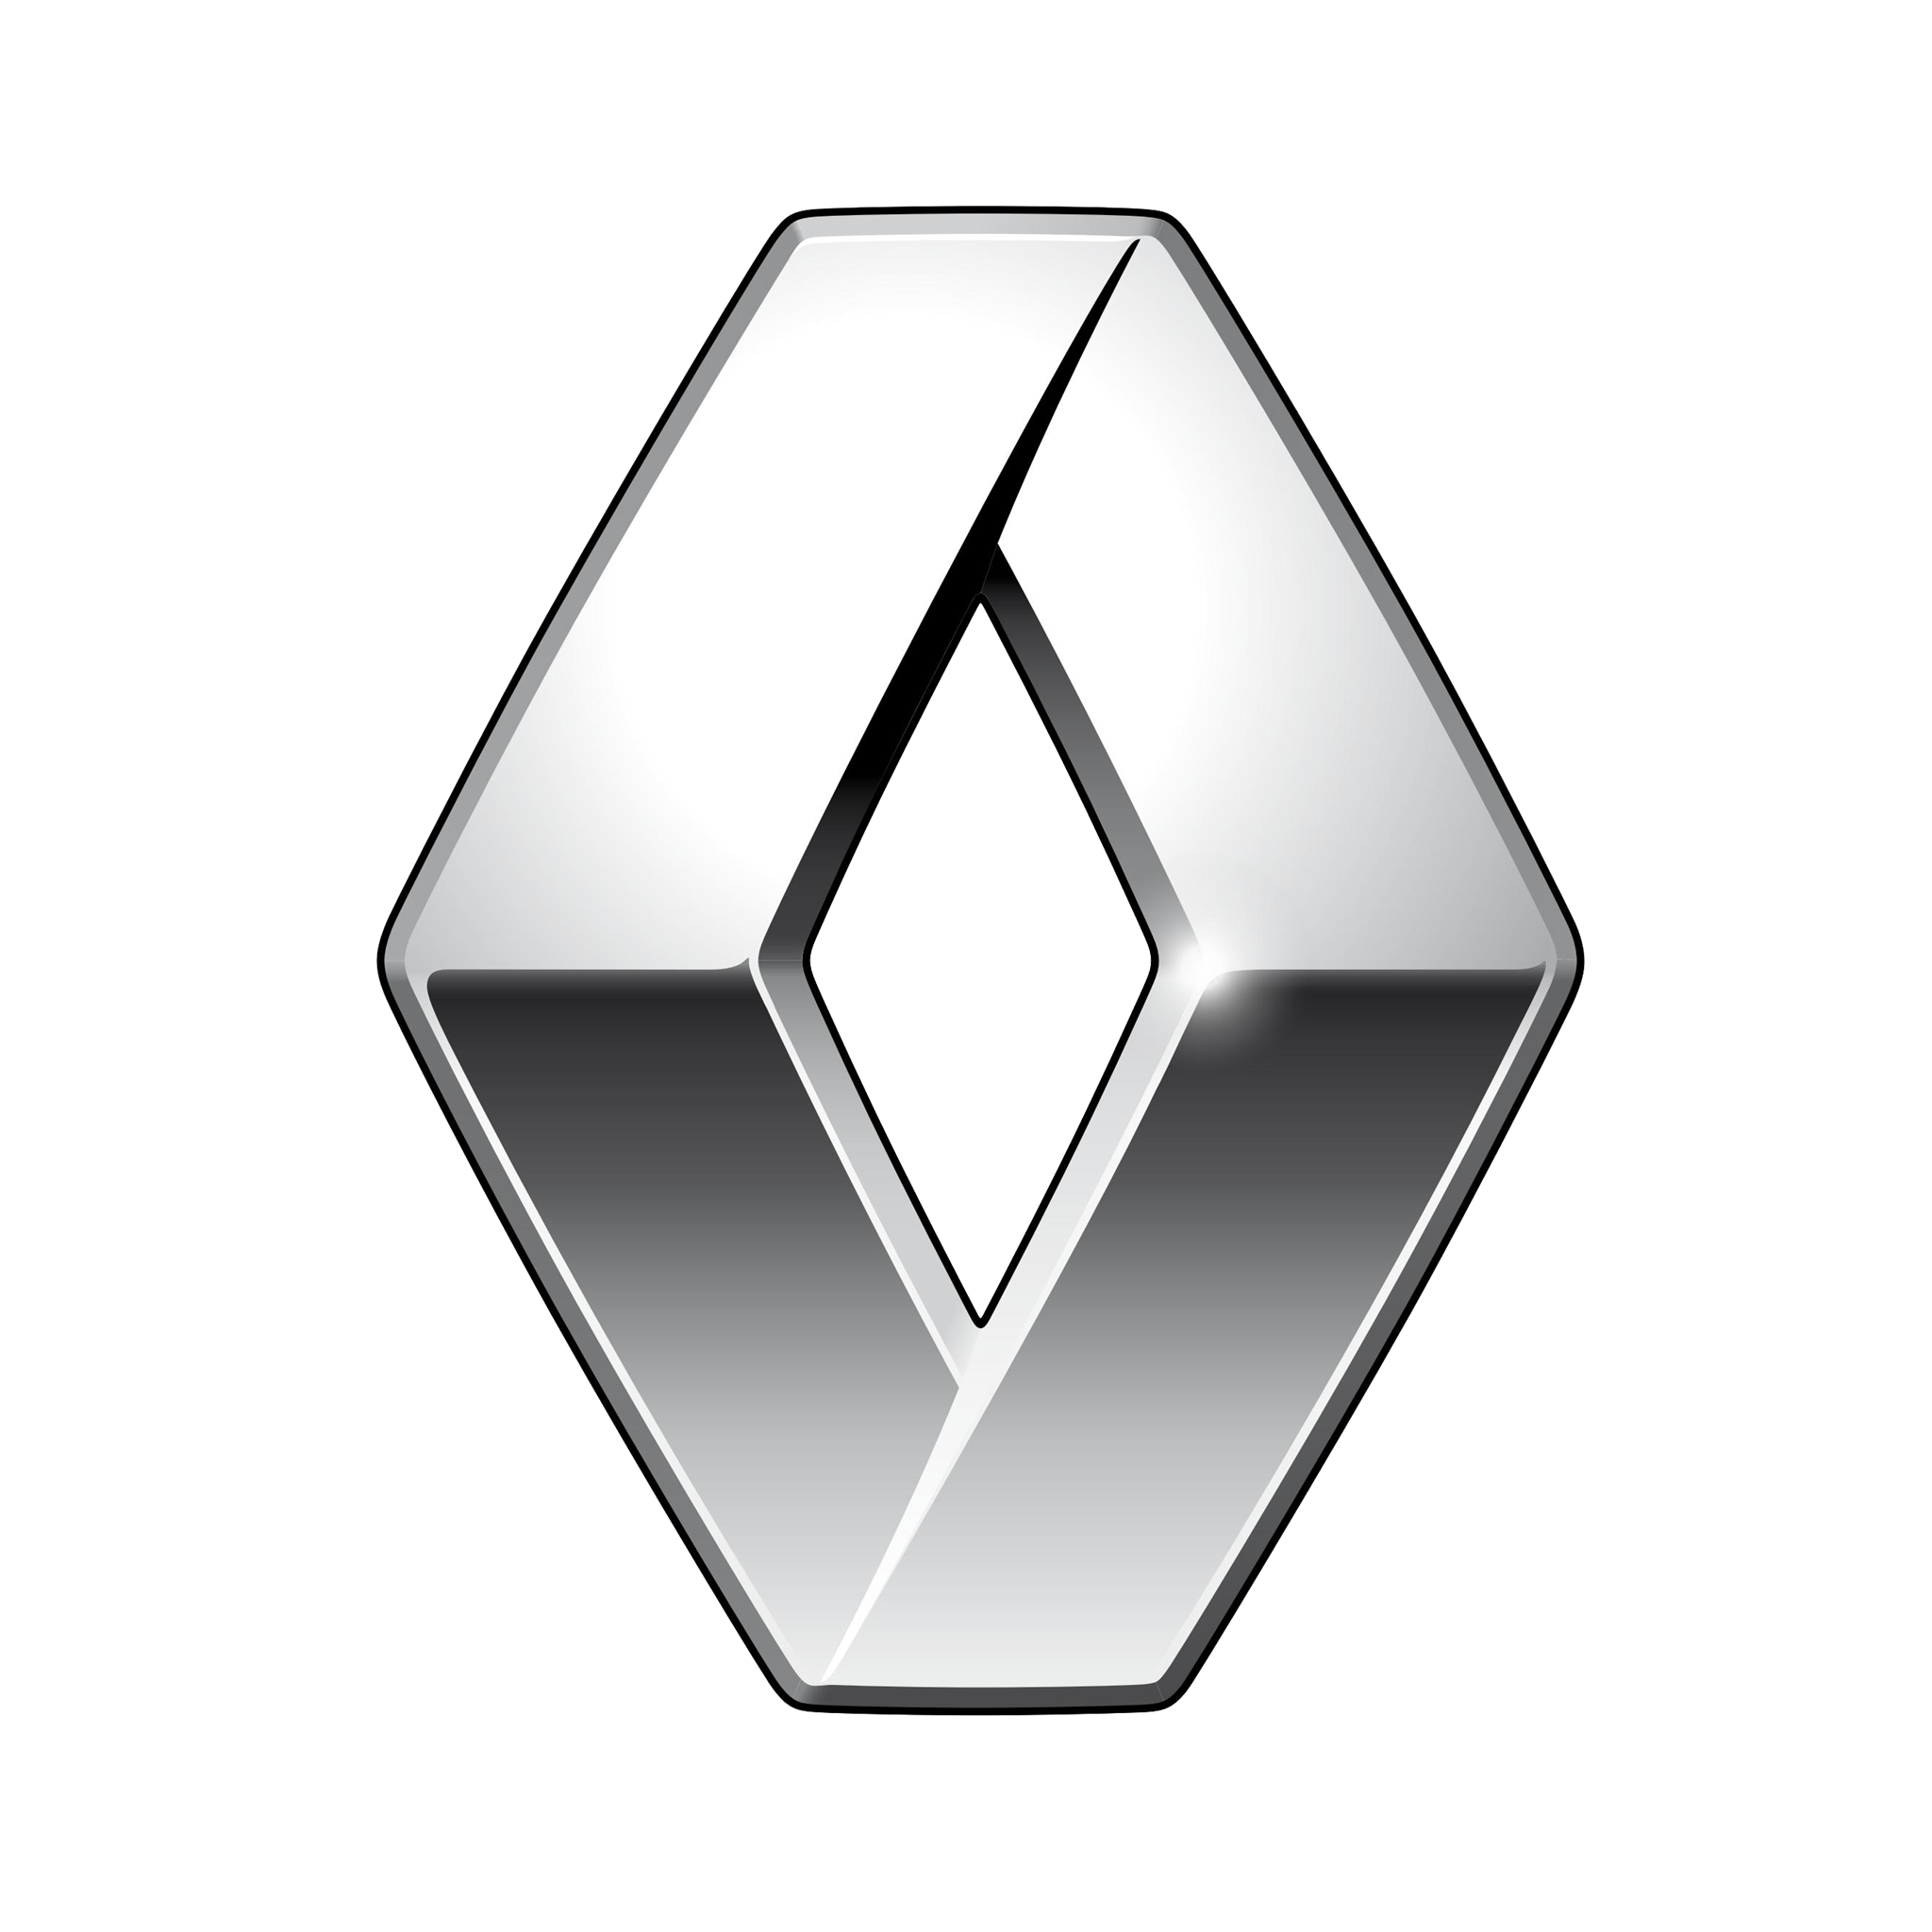 Renault logo clipart clip transparent library Renault Logo PNG Image - PurePNG   Free transparent CC0 PNG ... clip transparent library